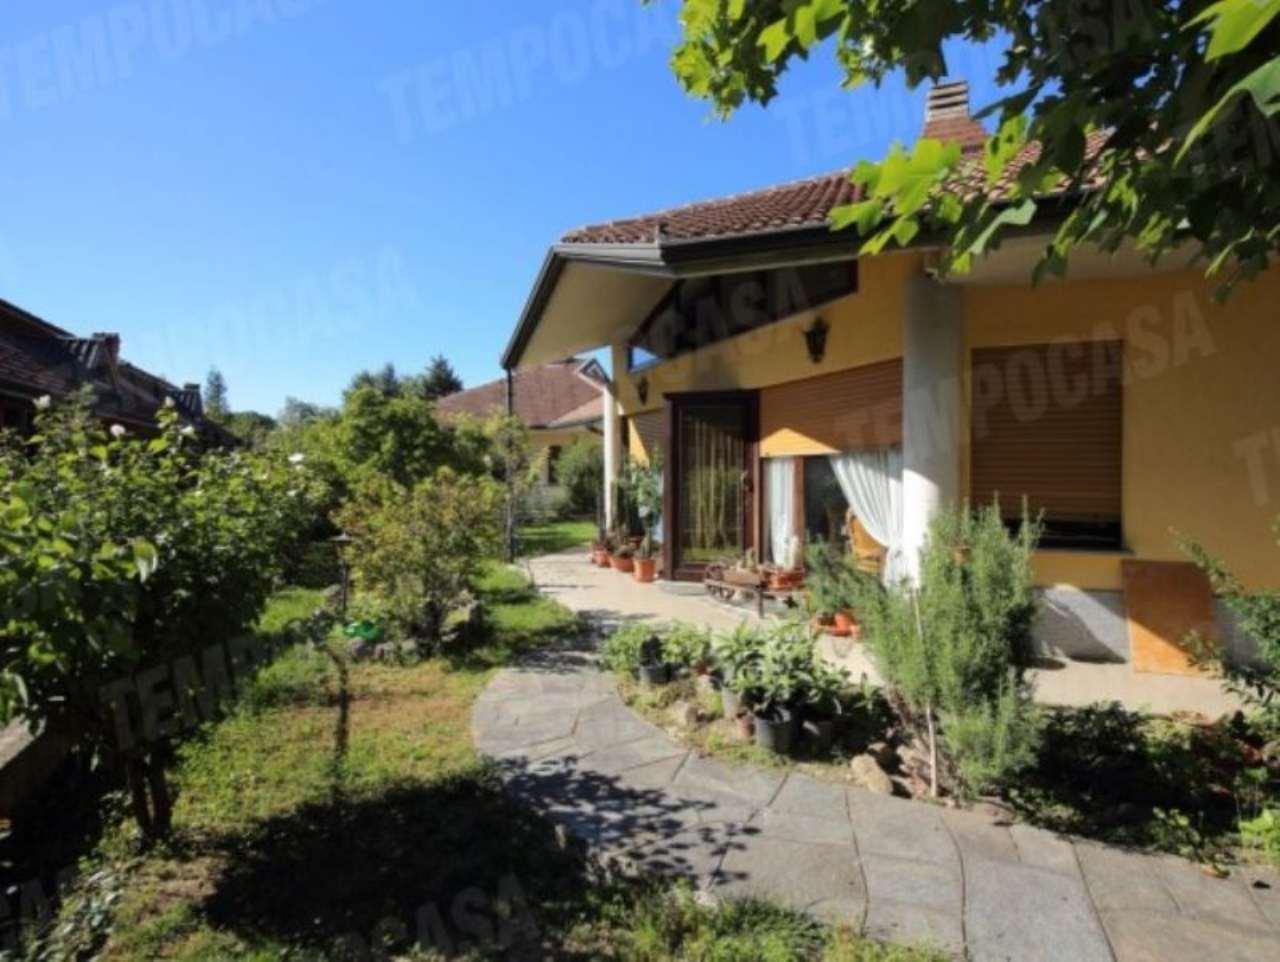 Villa in Vendita a San Raffaele Cimena